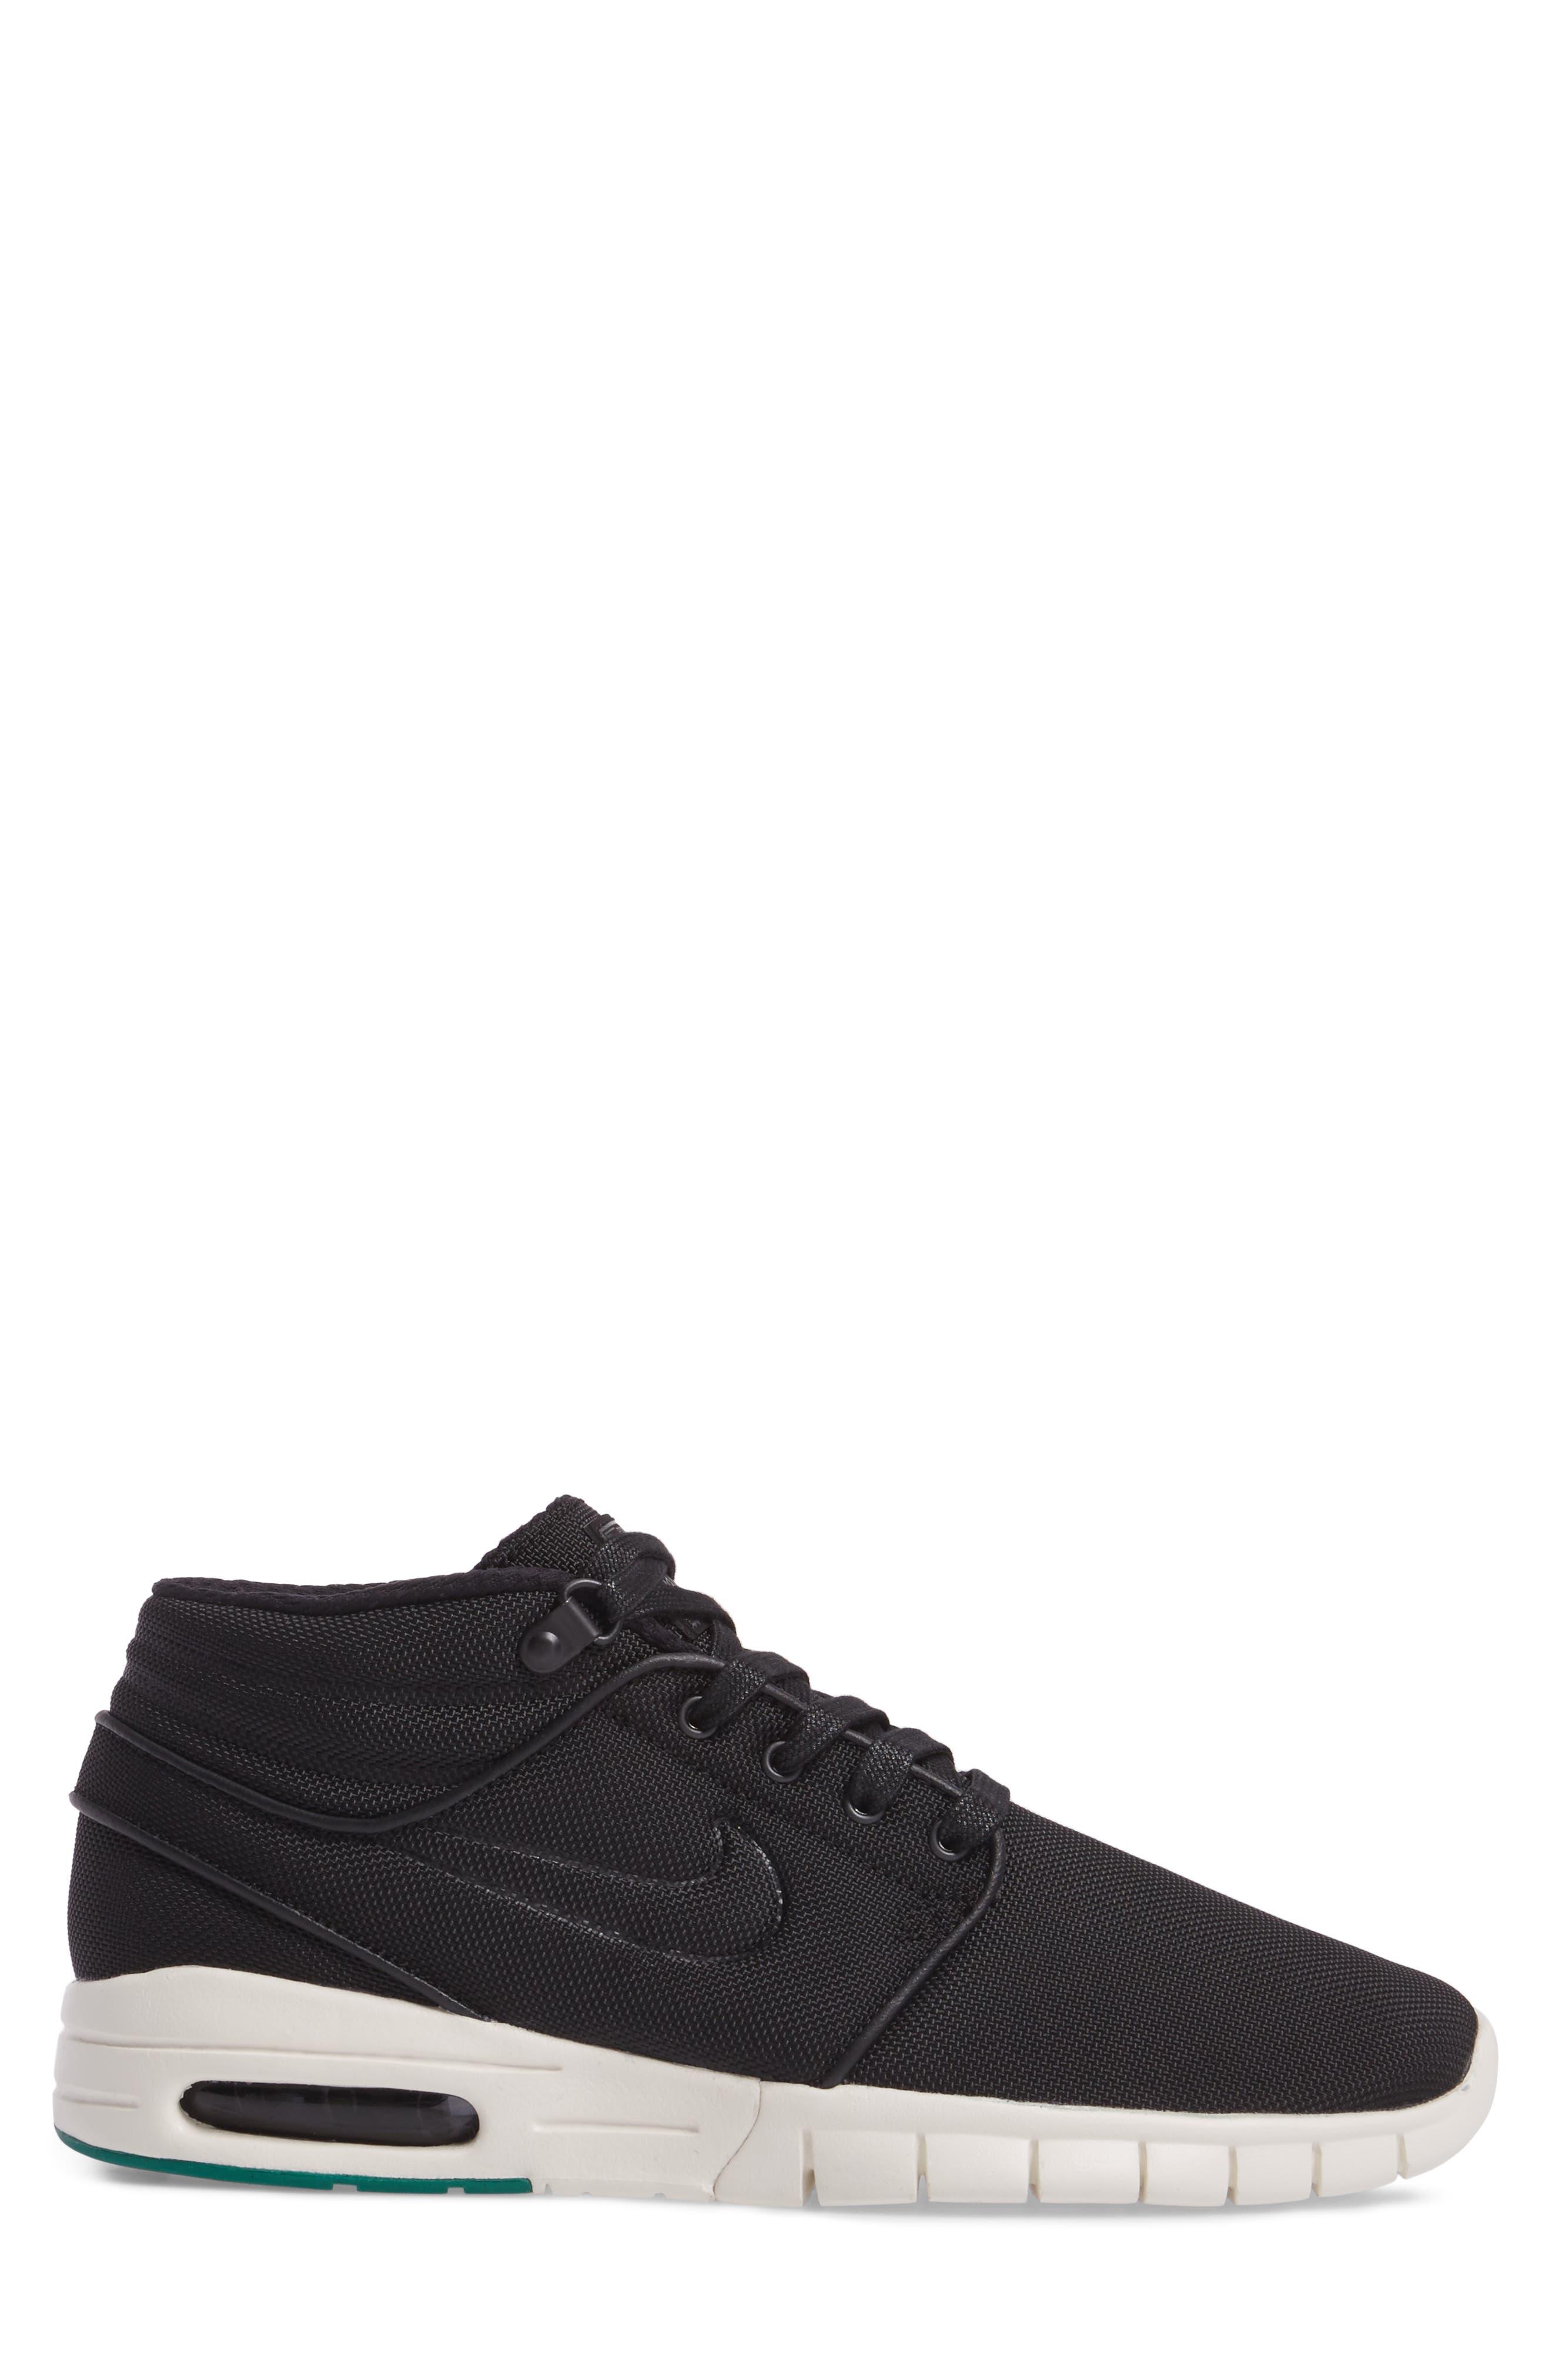 Alternate Image 3  - Nike SB Stefan Janoski Max Mid Skate Shoe (Men)